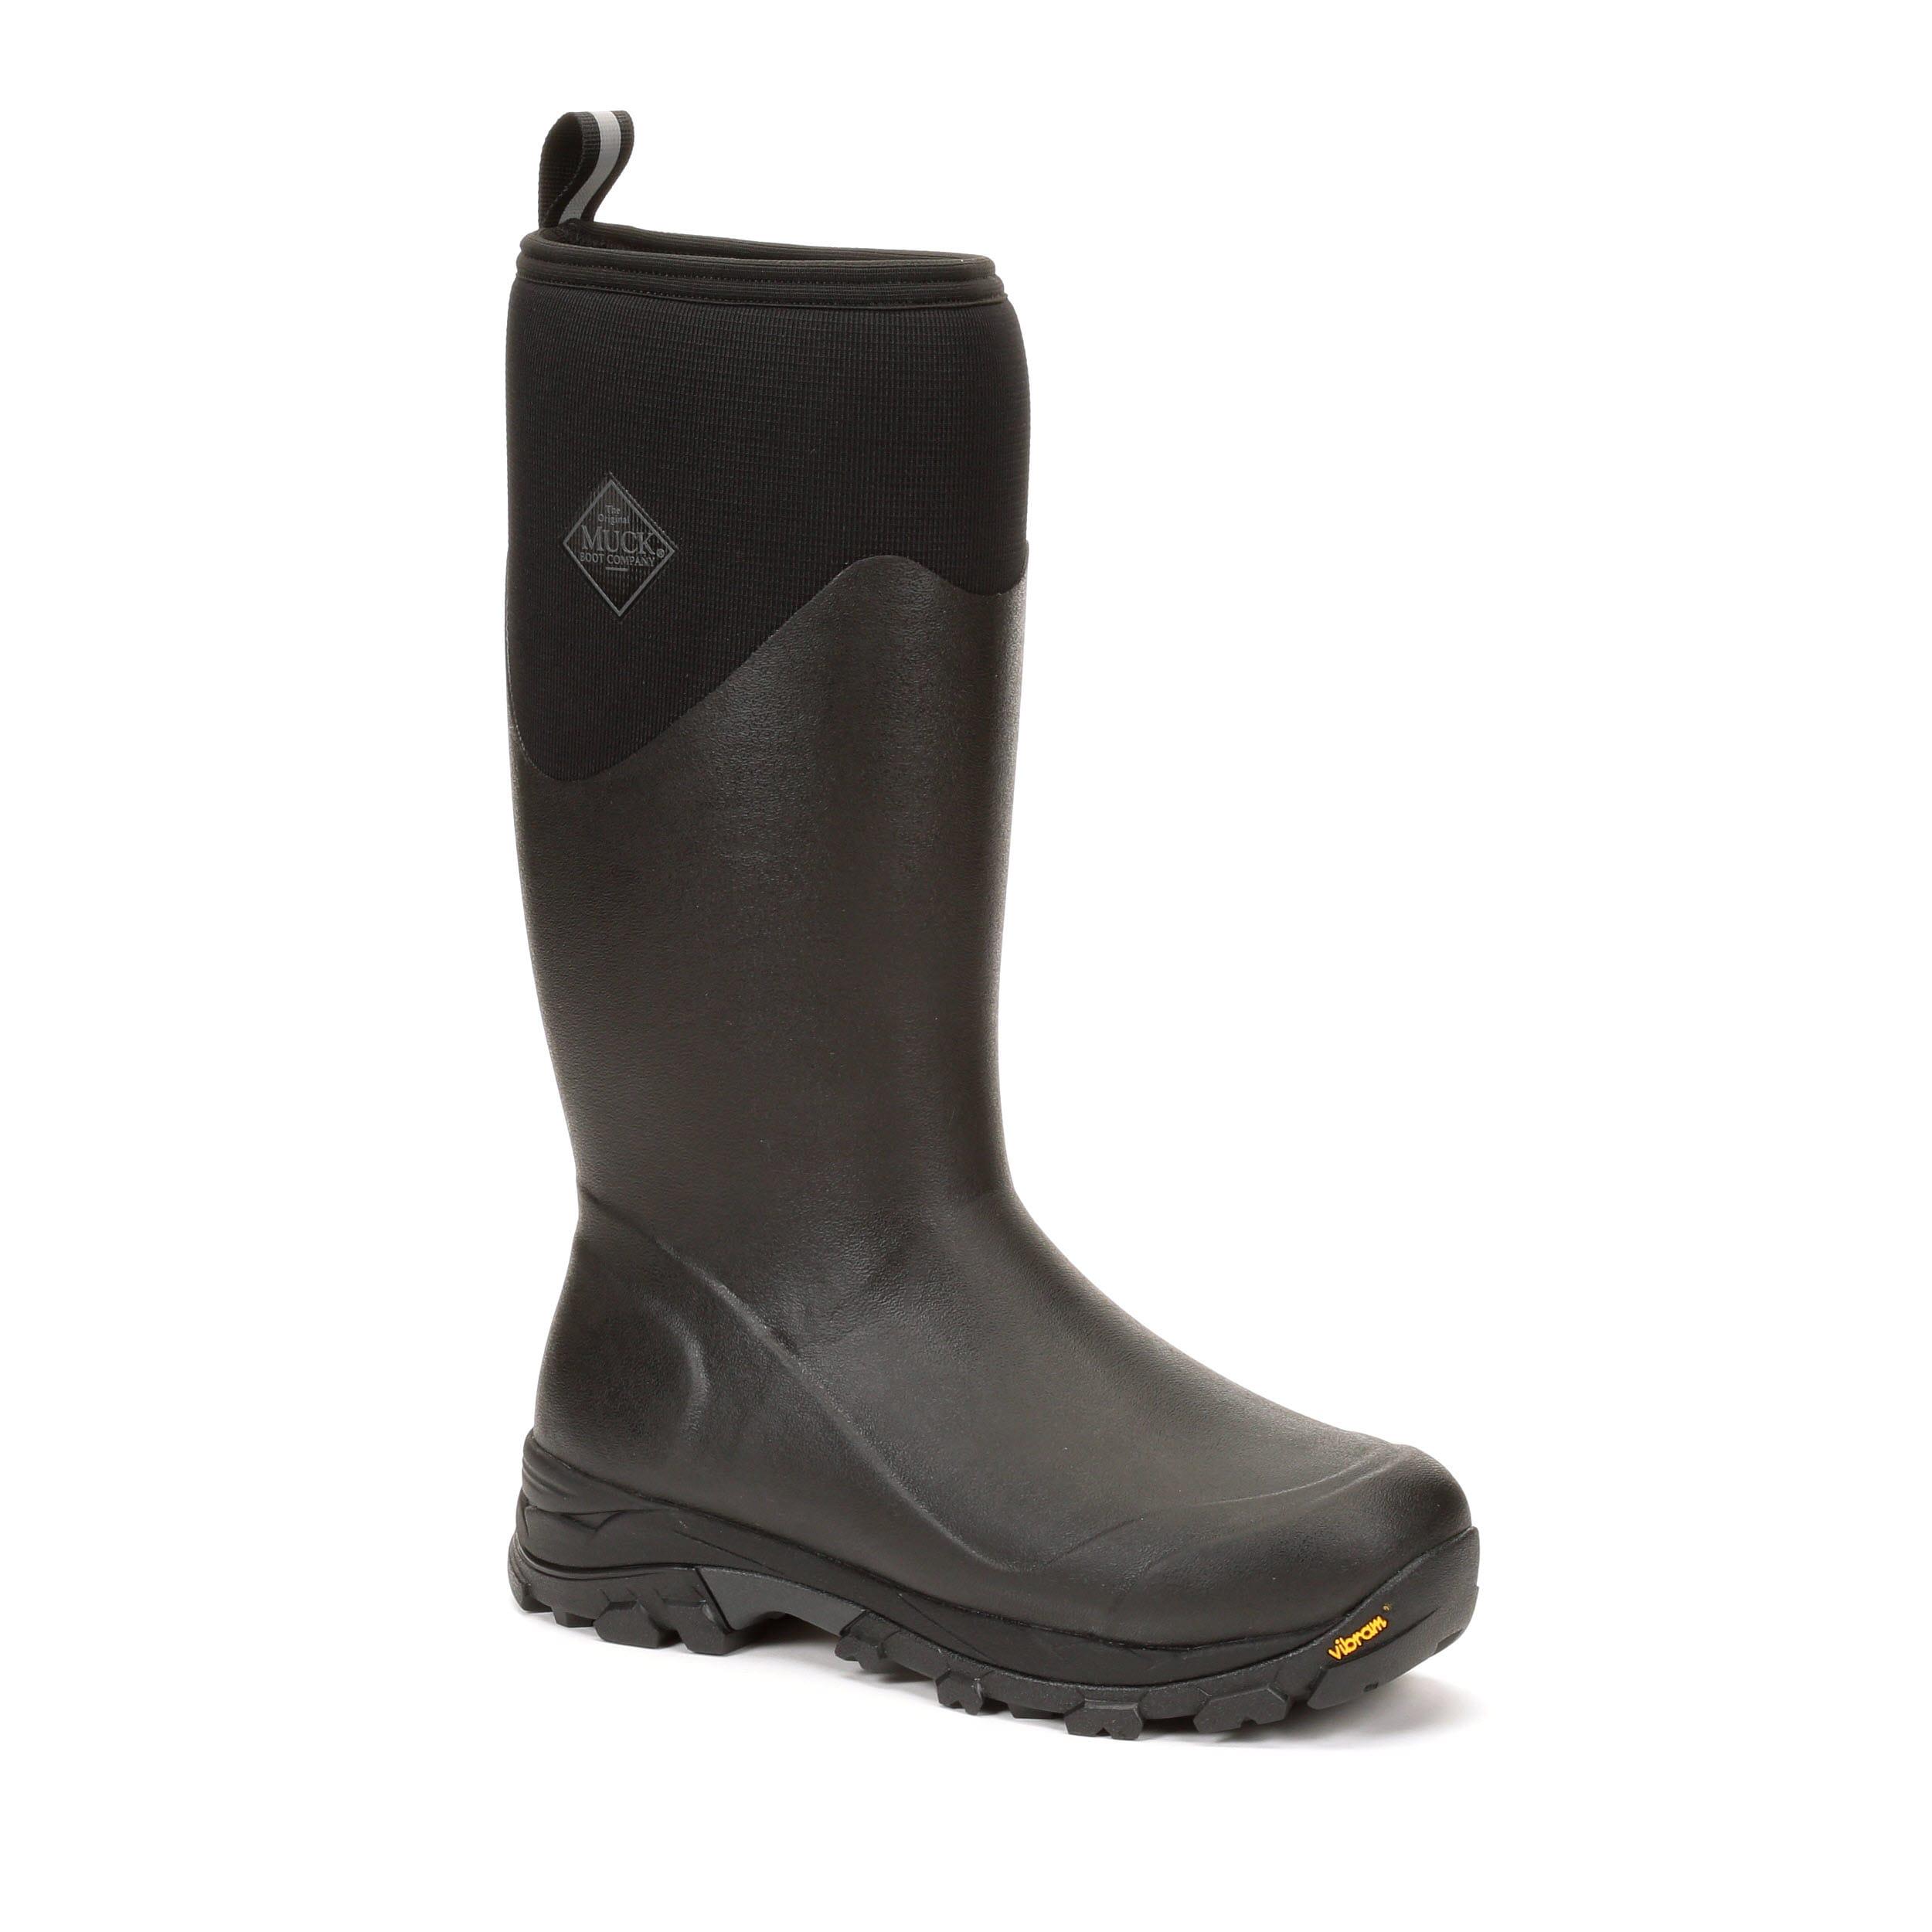 Muck Boot Arctic Ice Tall -saappaat miehille